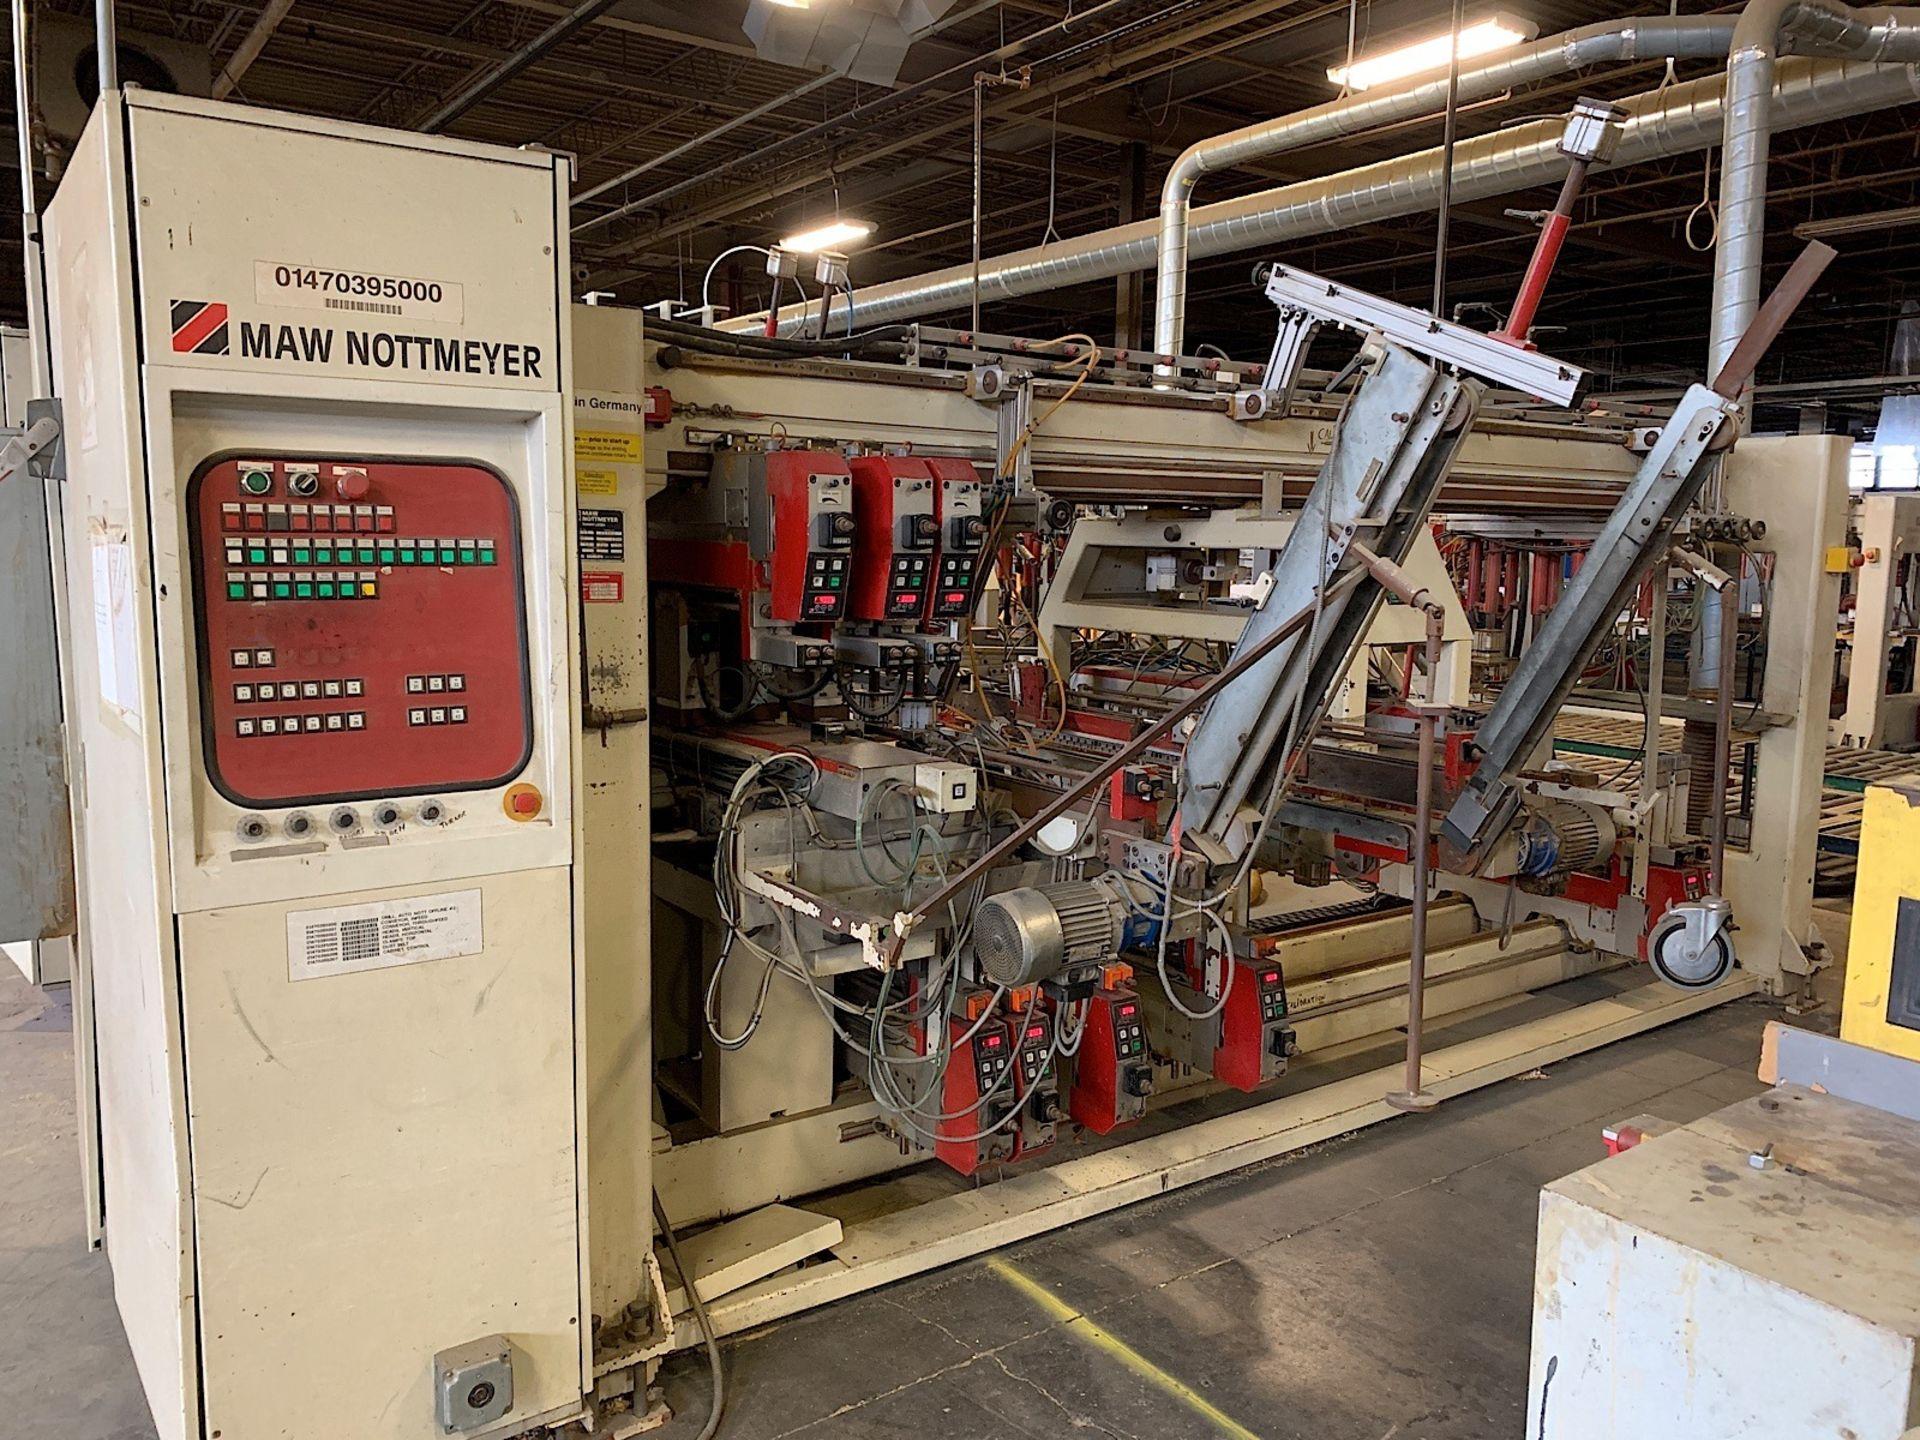 Lot 8b - IMA NOTTMEYER (NB 95) FEED THROUGH DRILLING MACHINE (SOLD SUBJECT TO BULK BID PRICE OF LOT 8)